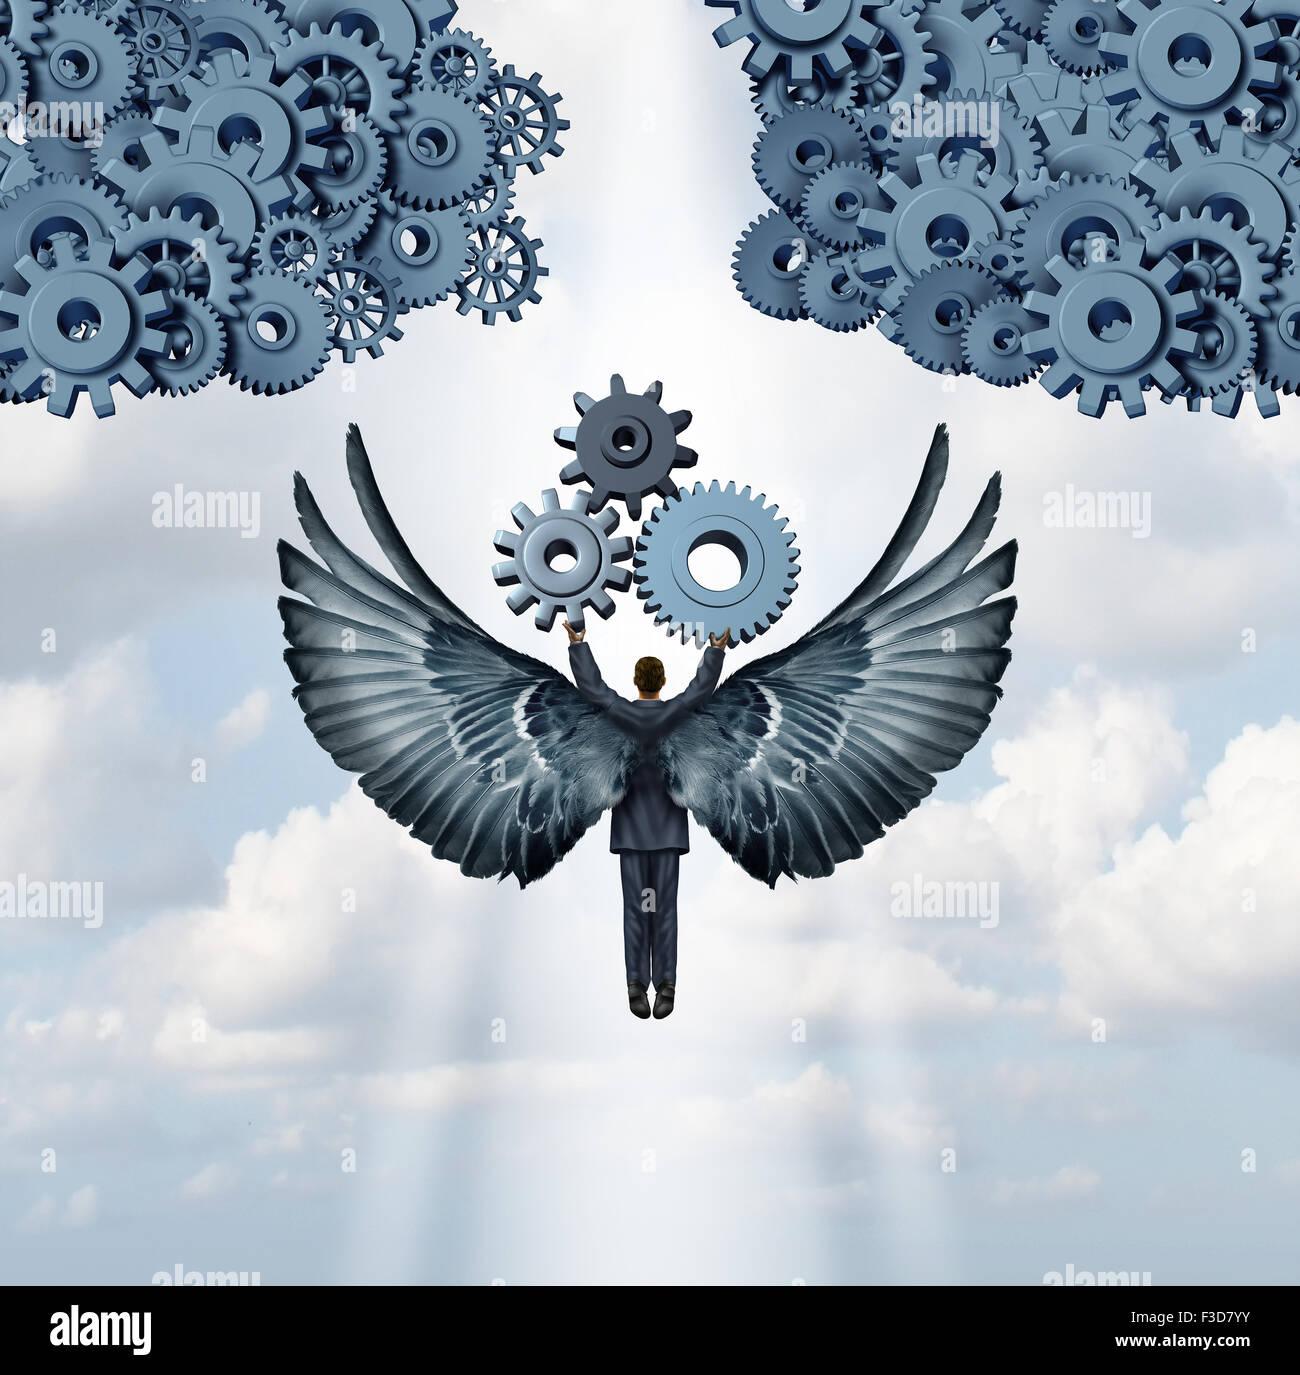 Business Angel Investor Concept And Entrepreneur Venture Capitalist